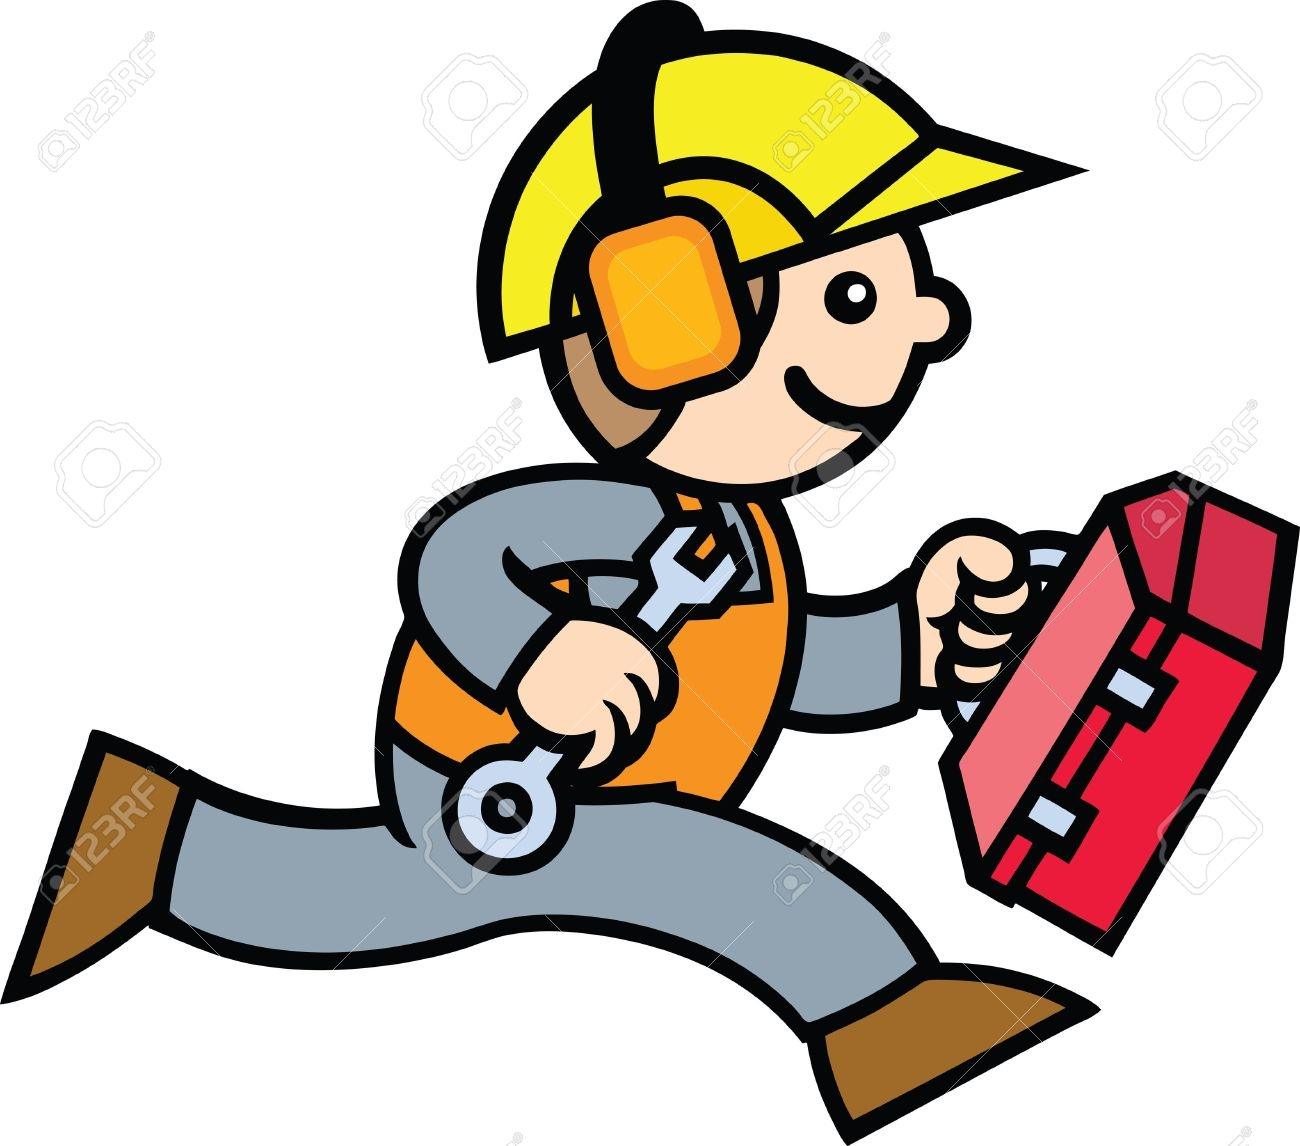 Construction Guy Clipart.